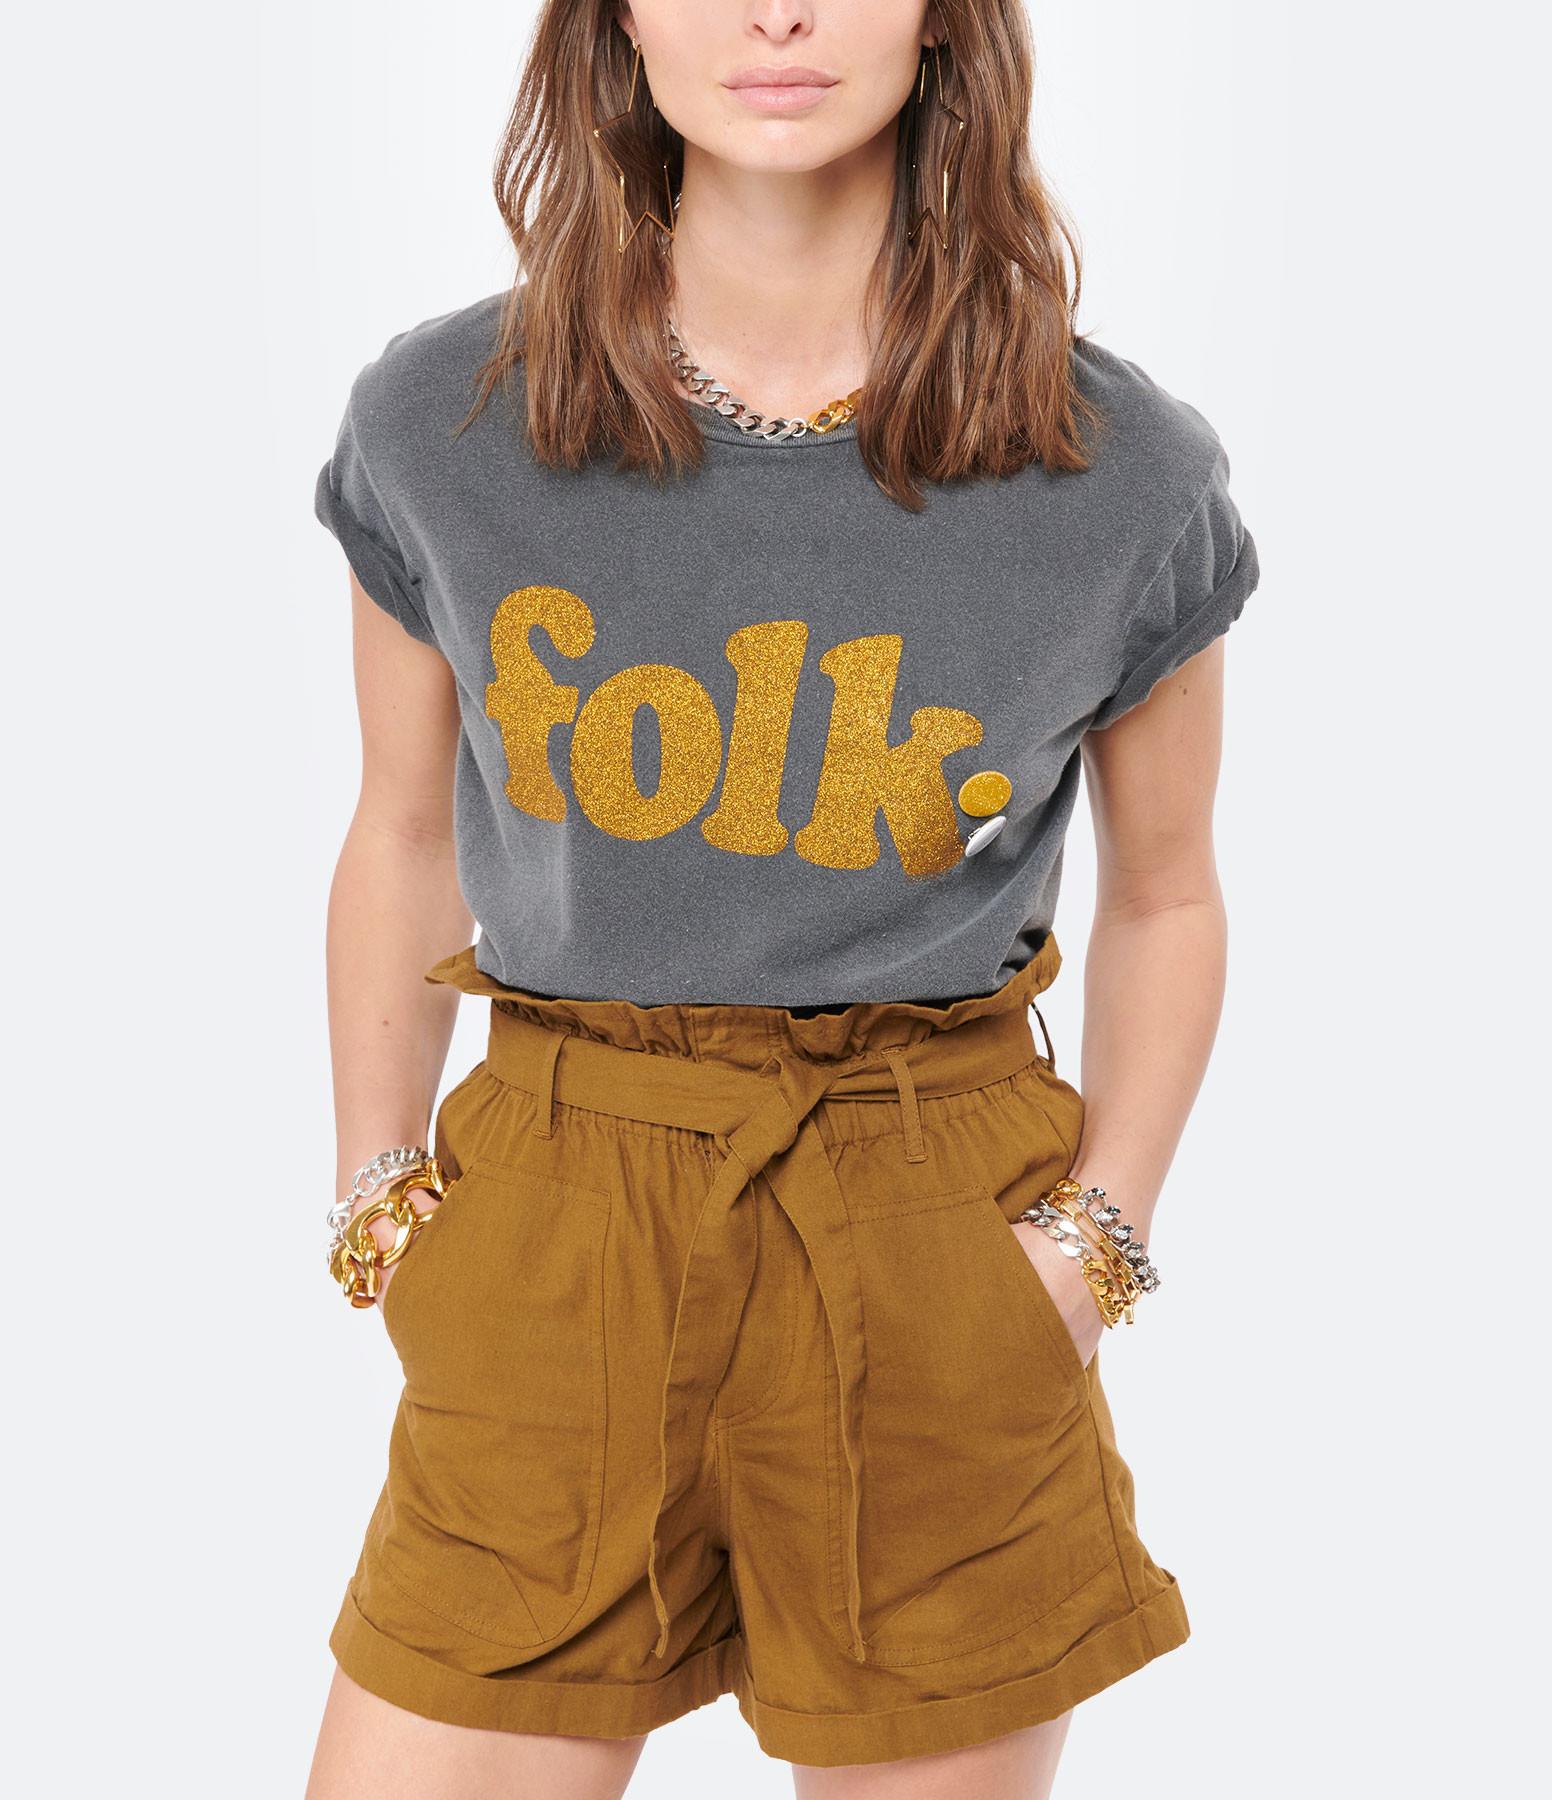 NEWTONE - Tee-shirt Starlight Folk Coton Pepper